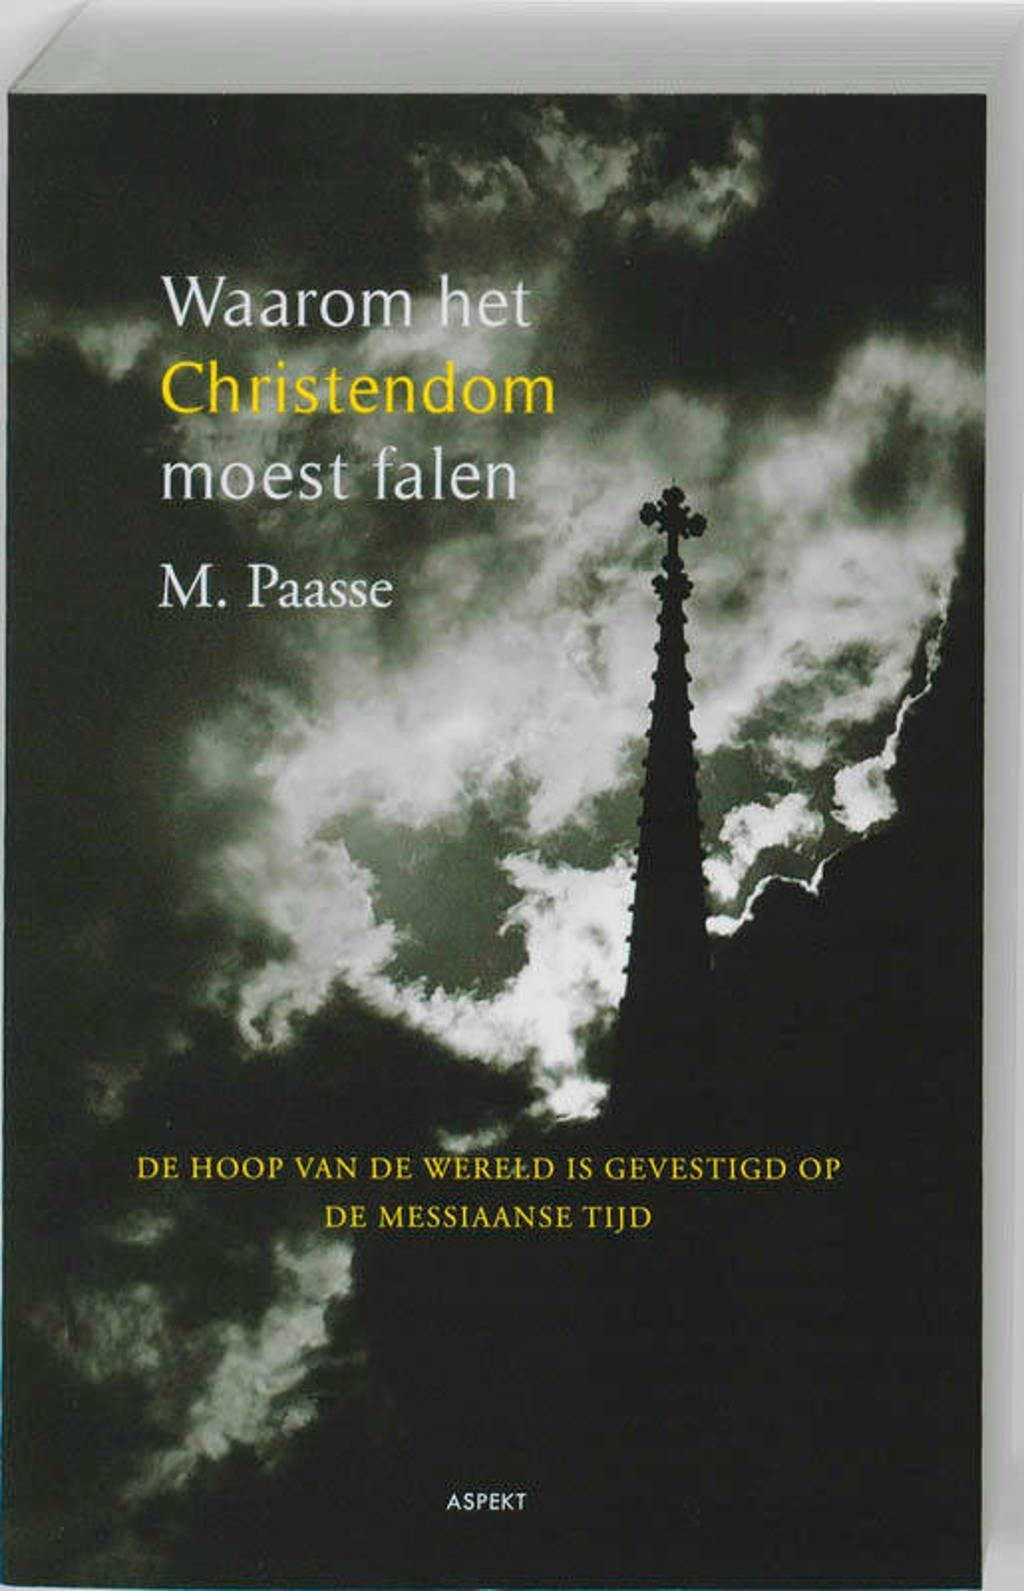 Waarom het christendom moest falen - M. Paasse